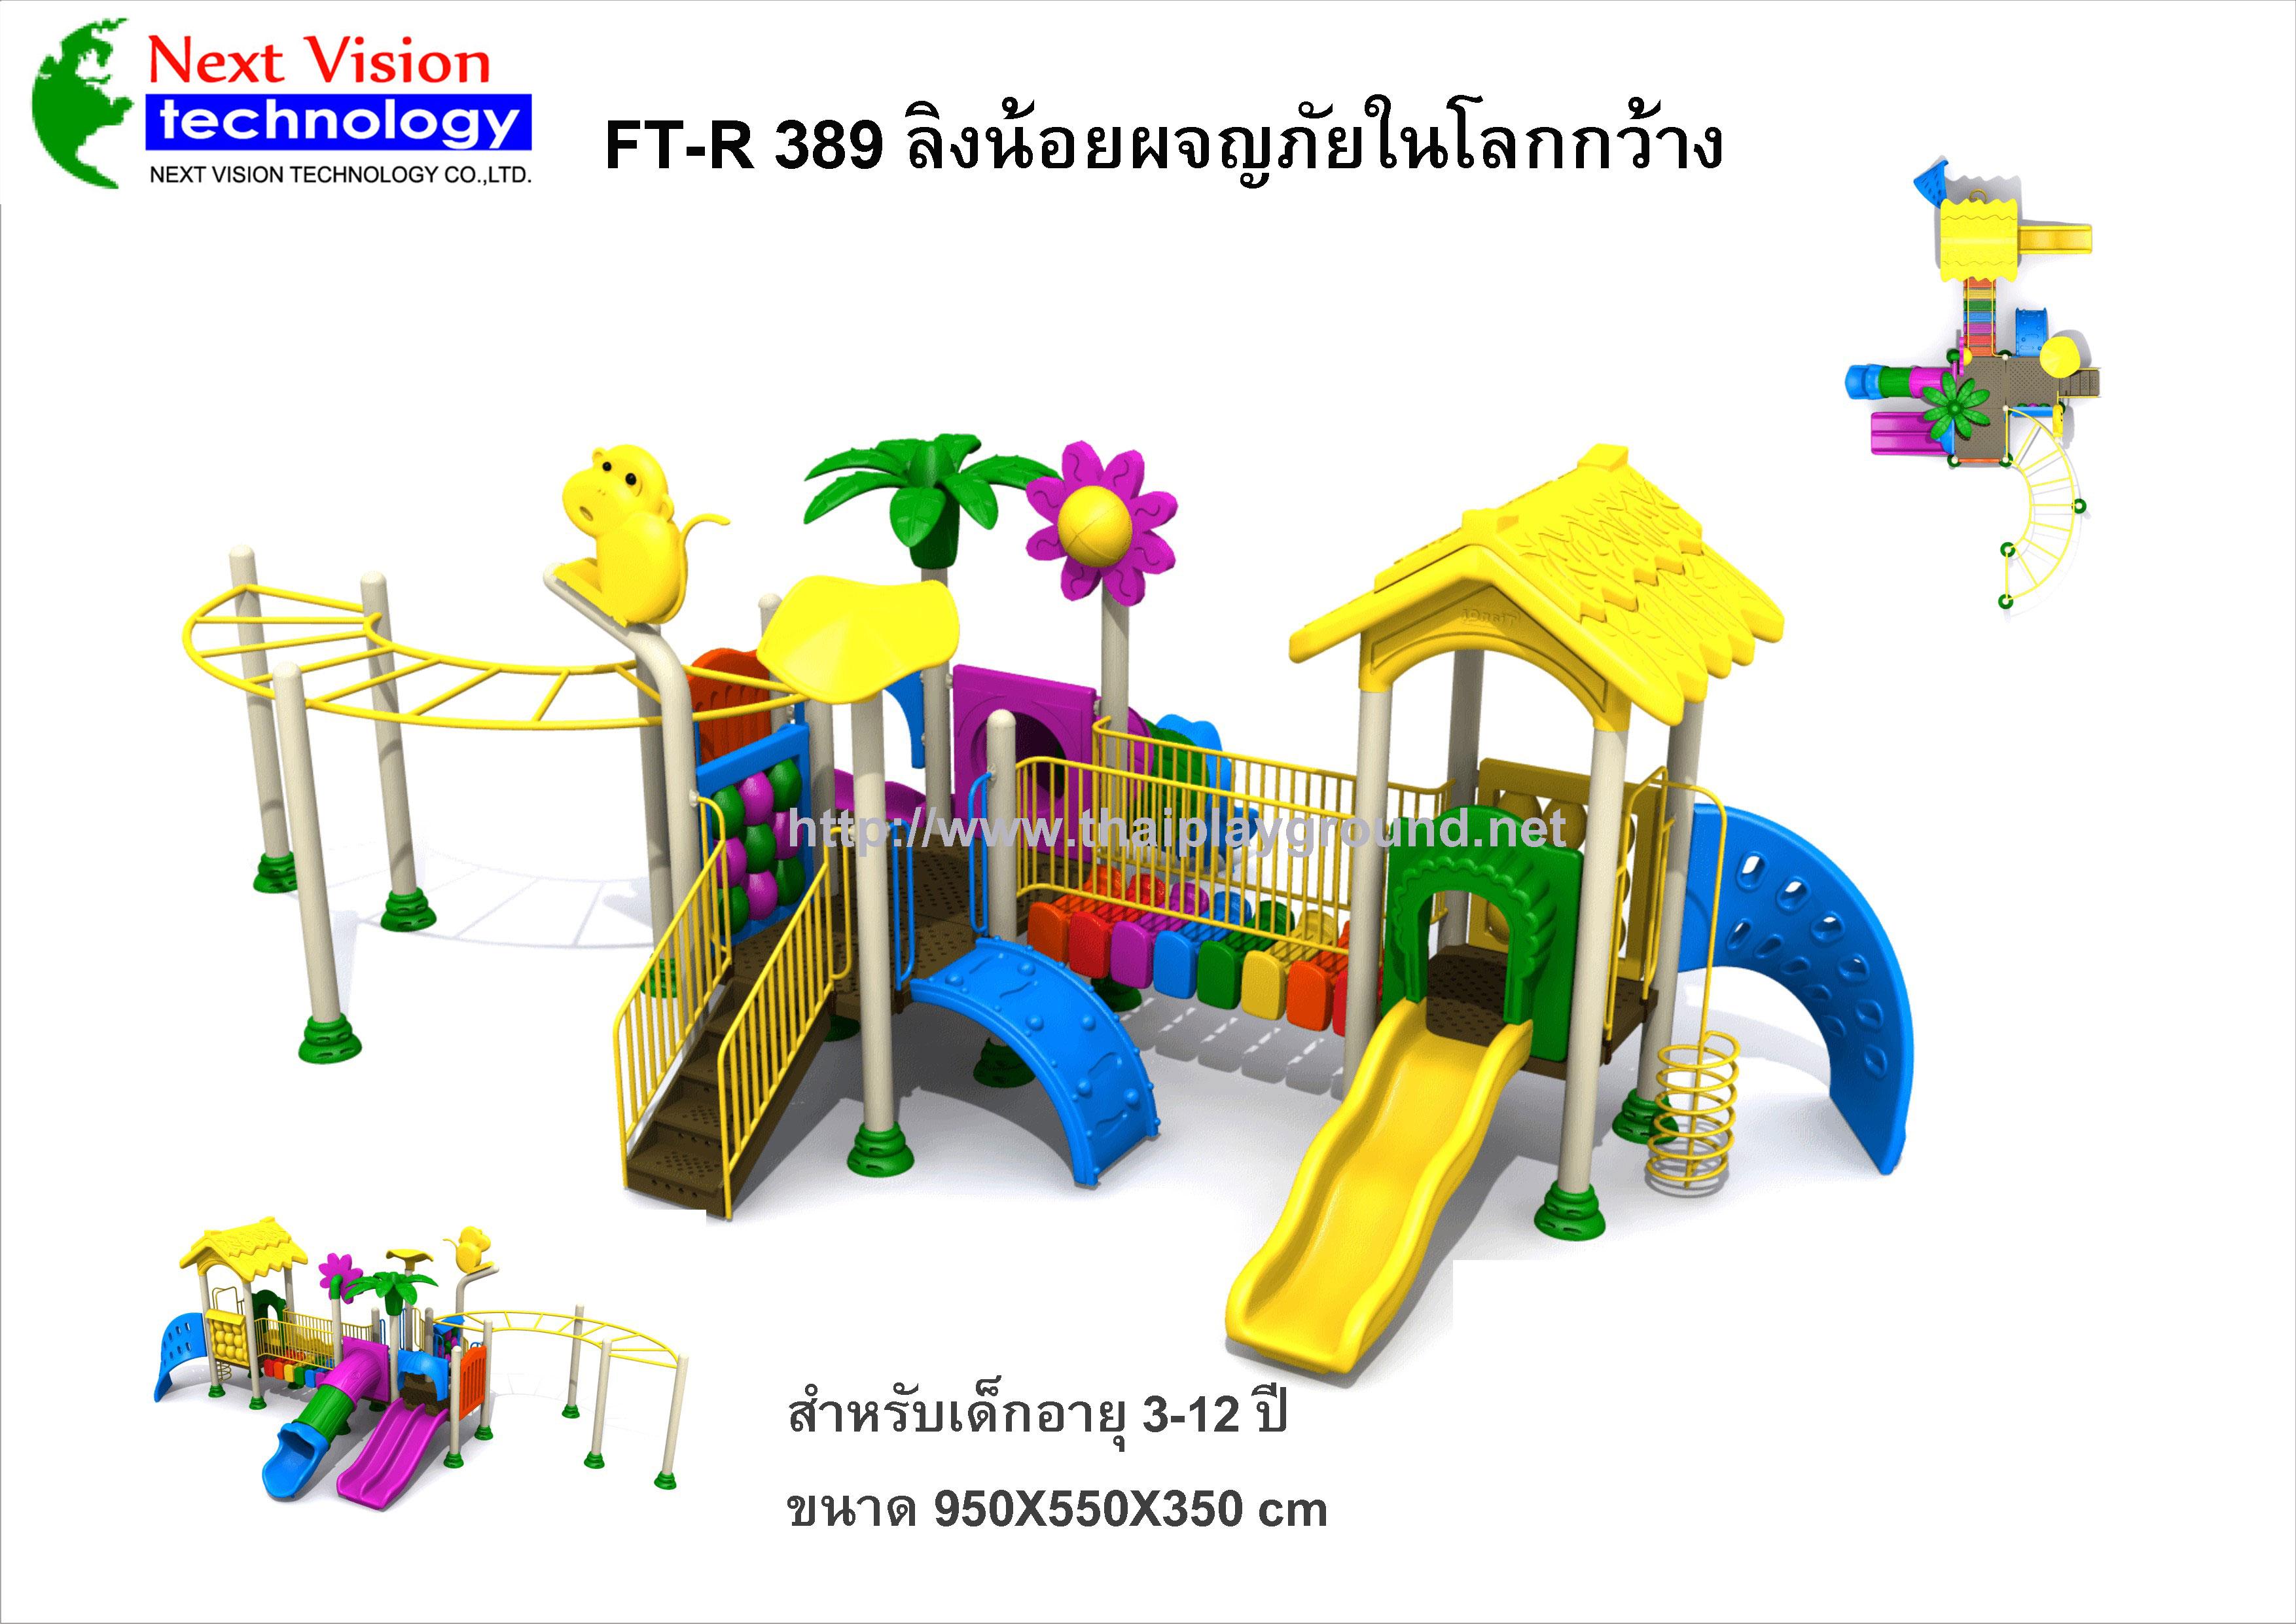 FT-R389 ลิงน้อยผจญภัยในโลกกว้าง